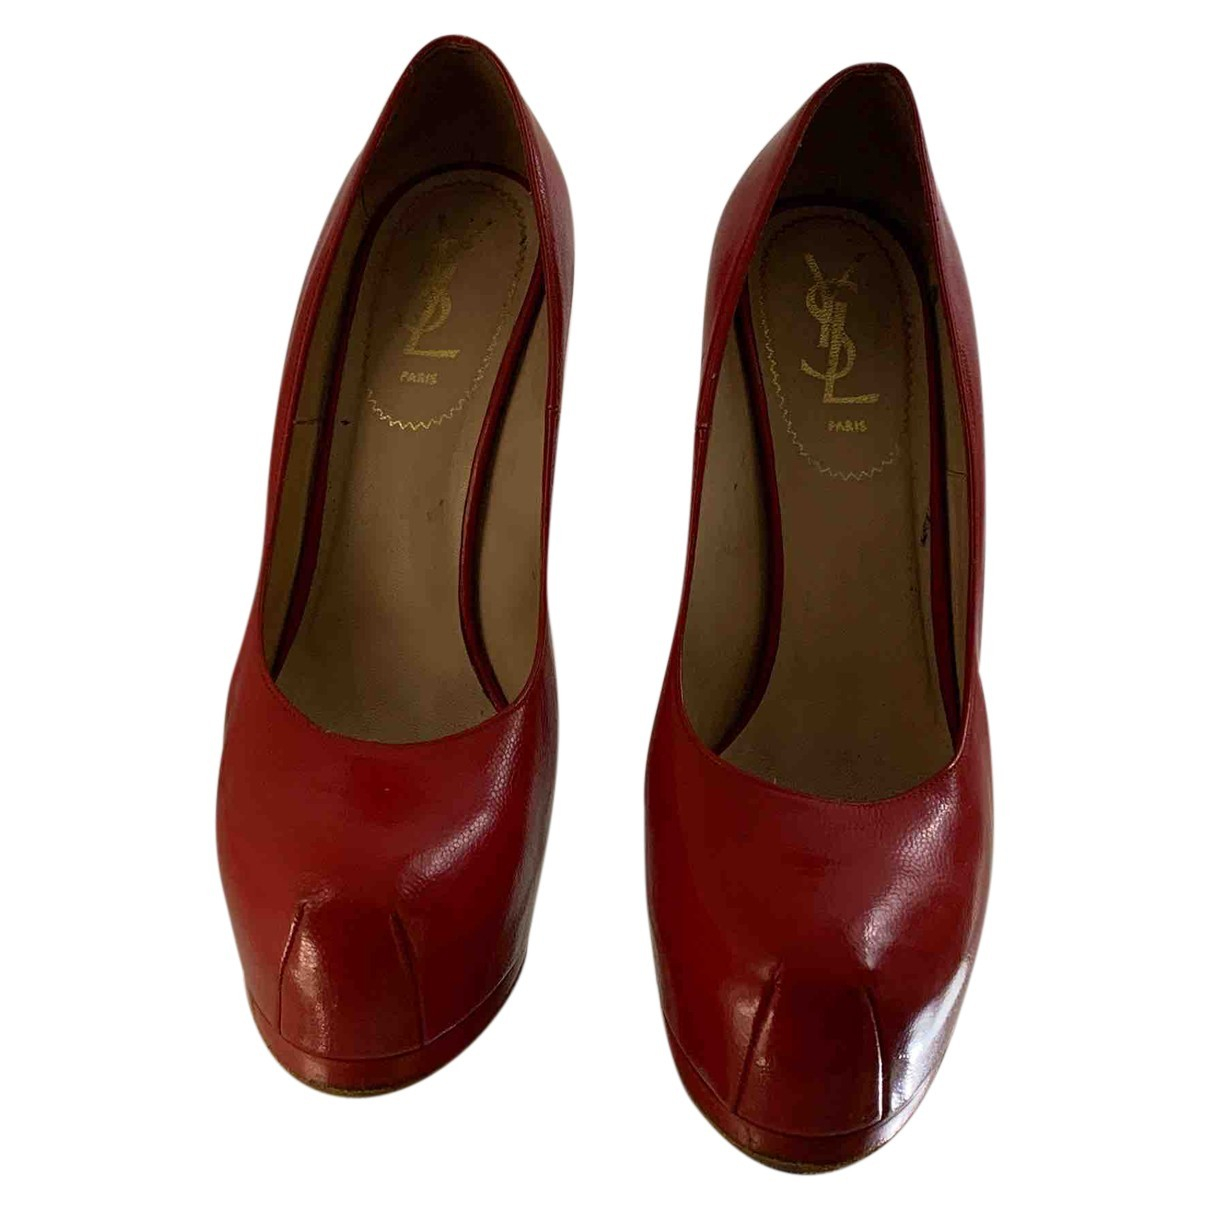 Yves Saint Laurent Trib Too Red Leather Heels for Women 39.5 EU